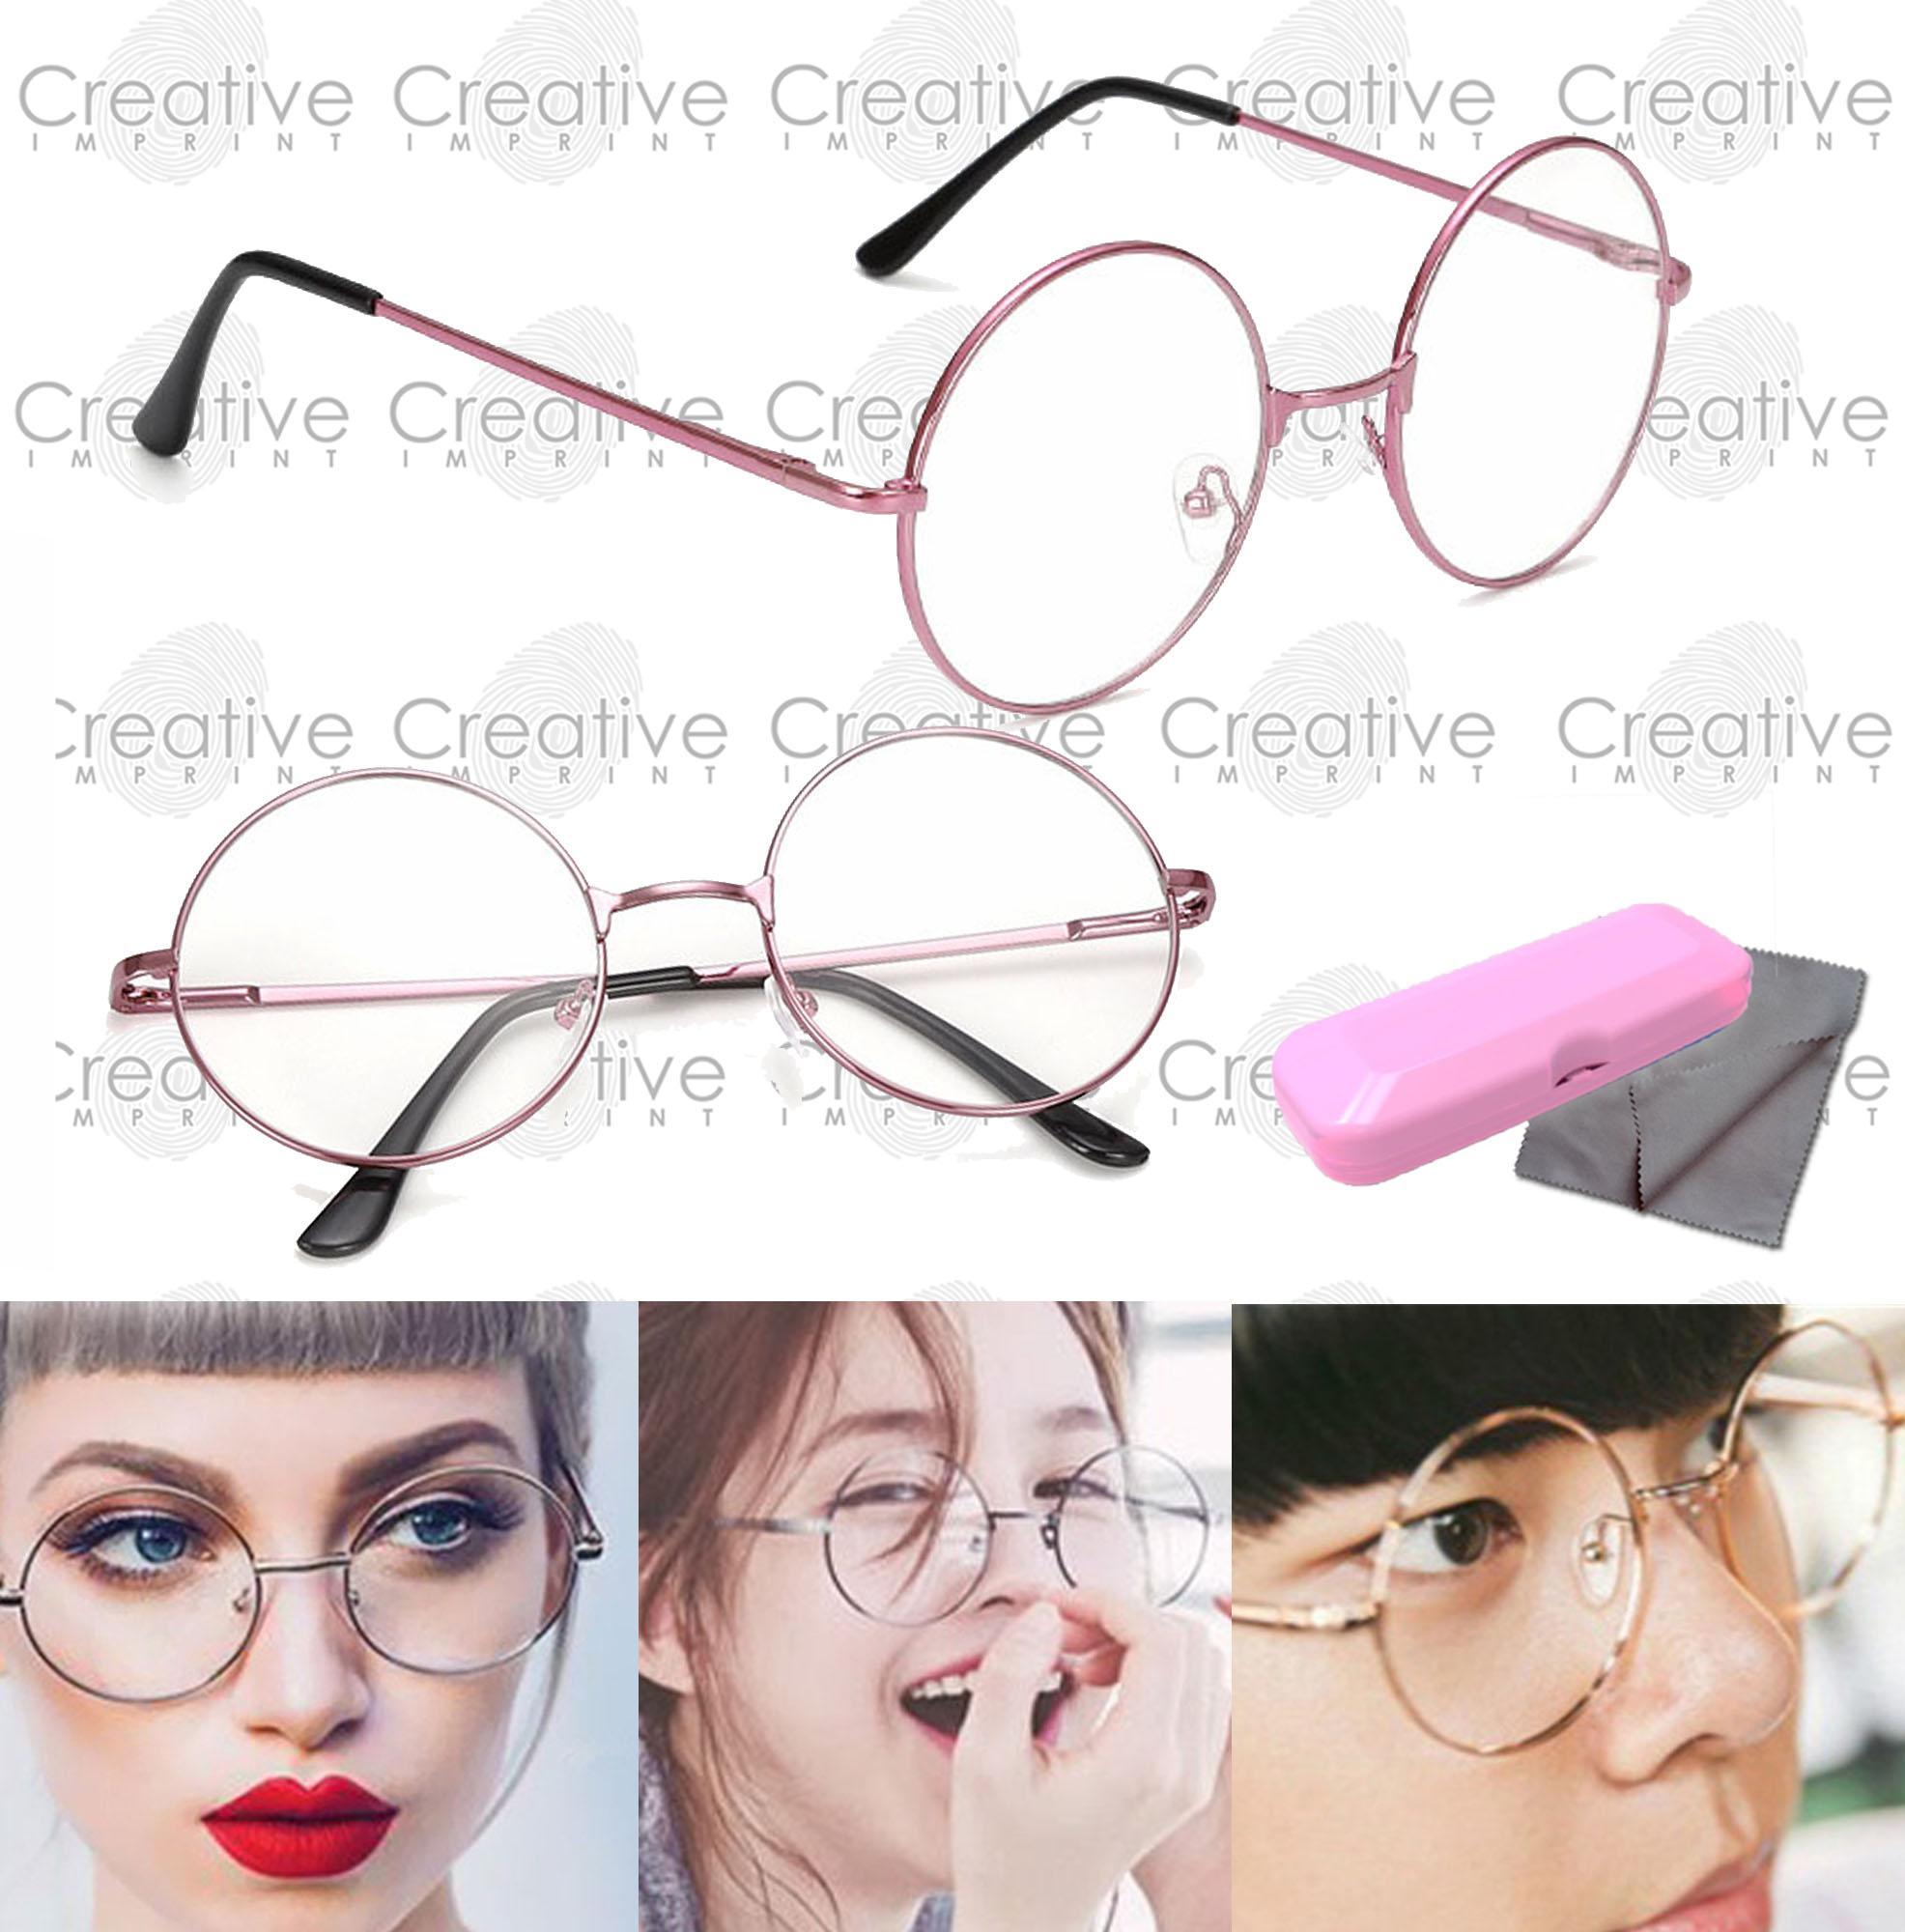 b2ca79562ee Creative Imprint Retro Round Clear Specs (Pink Frame) Flat Lens Eyeglass  Trendy Harry Potter